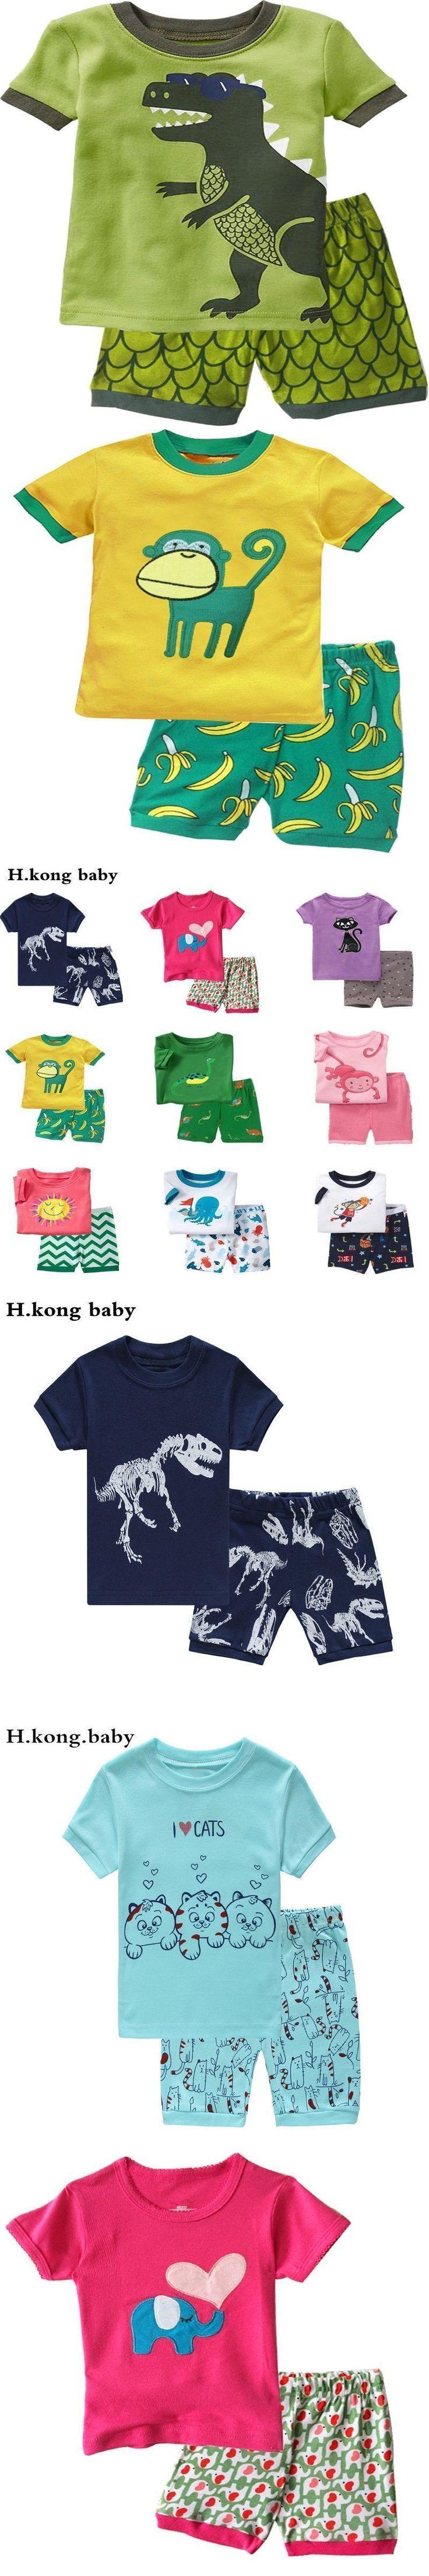 H.kong baby children's pajamas set boy cartoon pajamas girl cute family 100% cotton nightgown short sleeve+shorts kids sleepwear #babynightgowns #babygirlpajamas